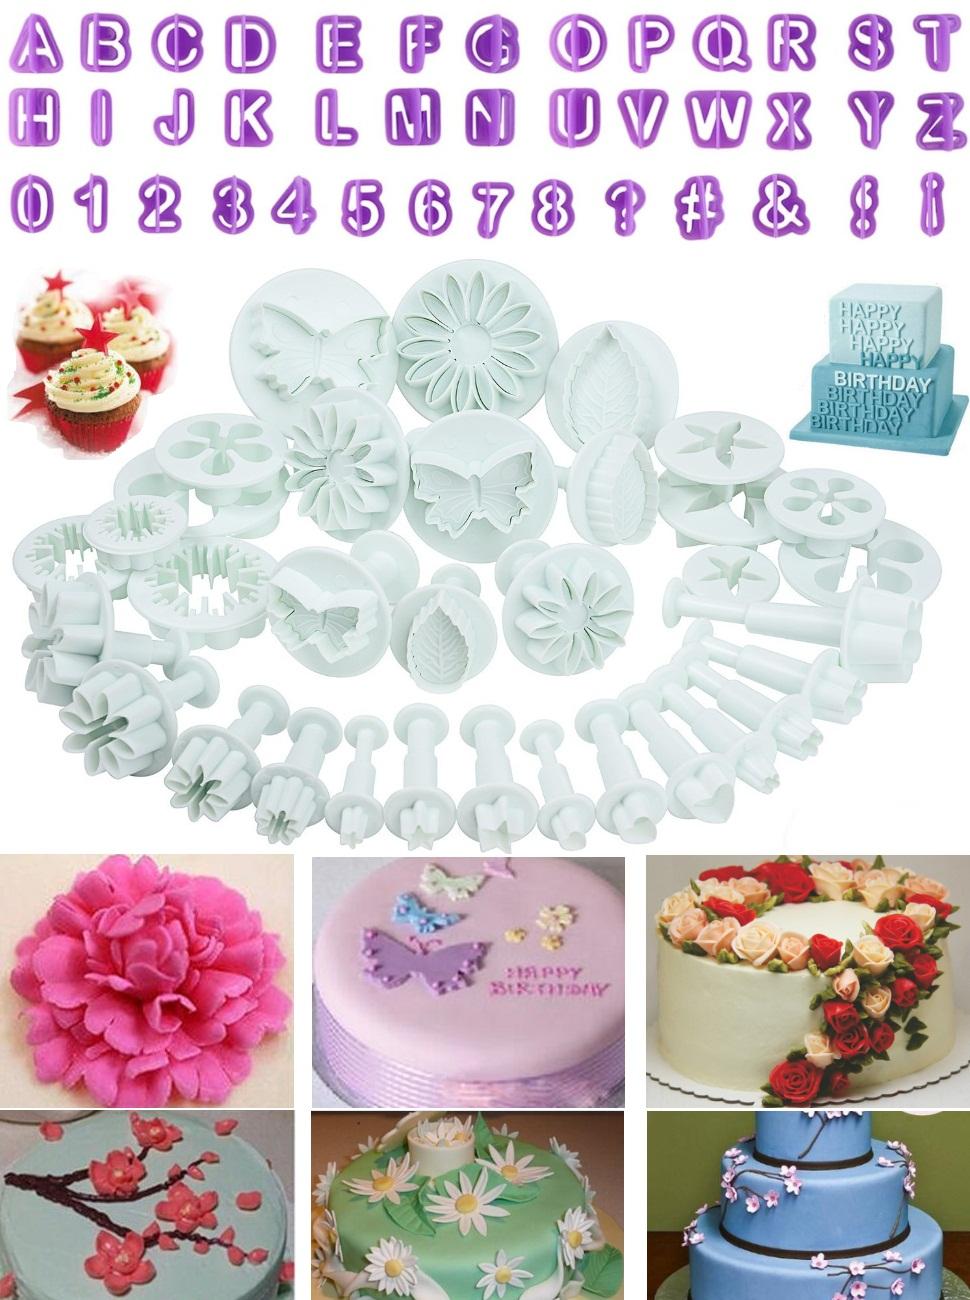 Sugarcraft Baking Tool set Cake Decorating Mould Mold Paste Flower Modelling